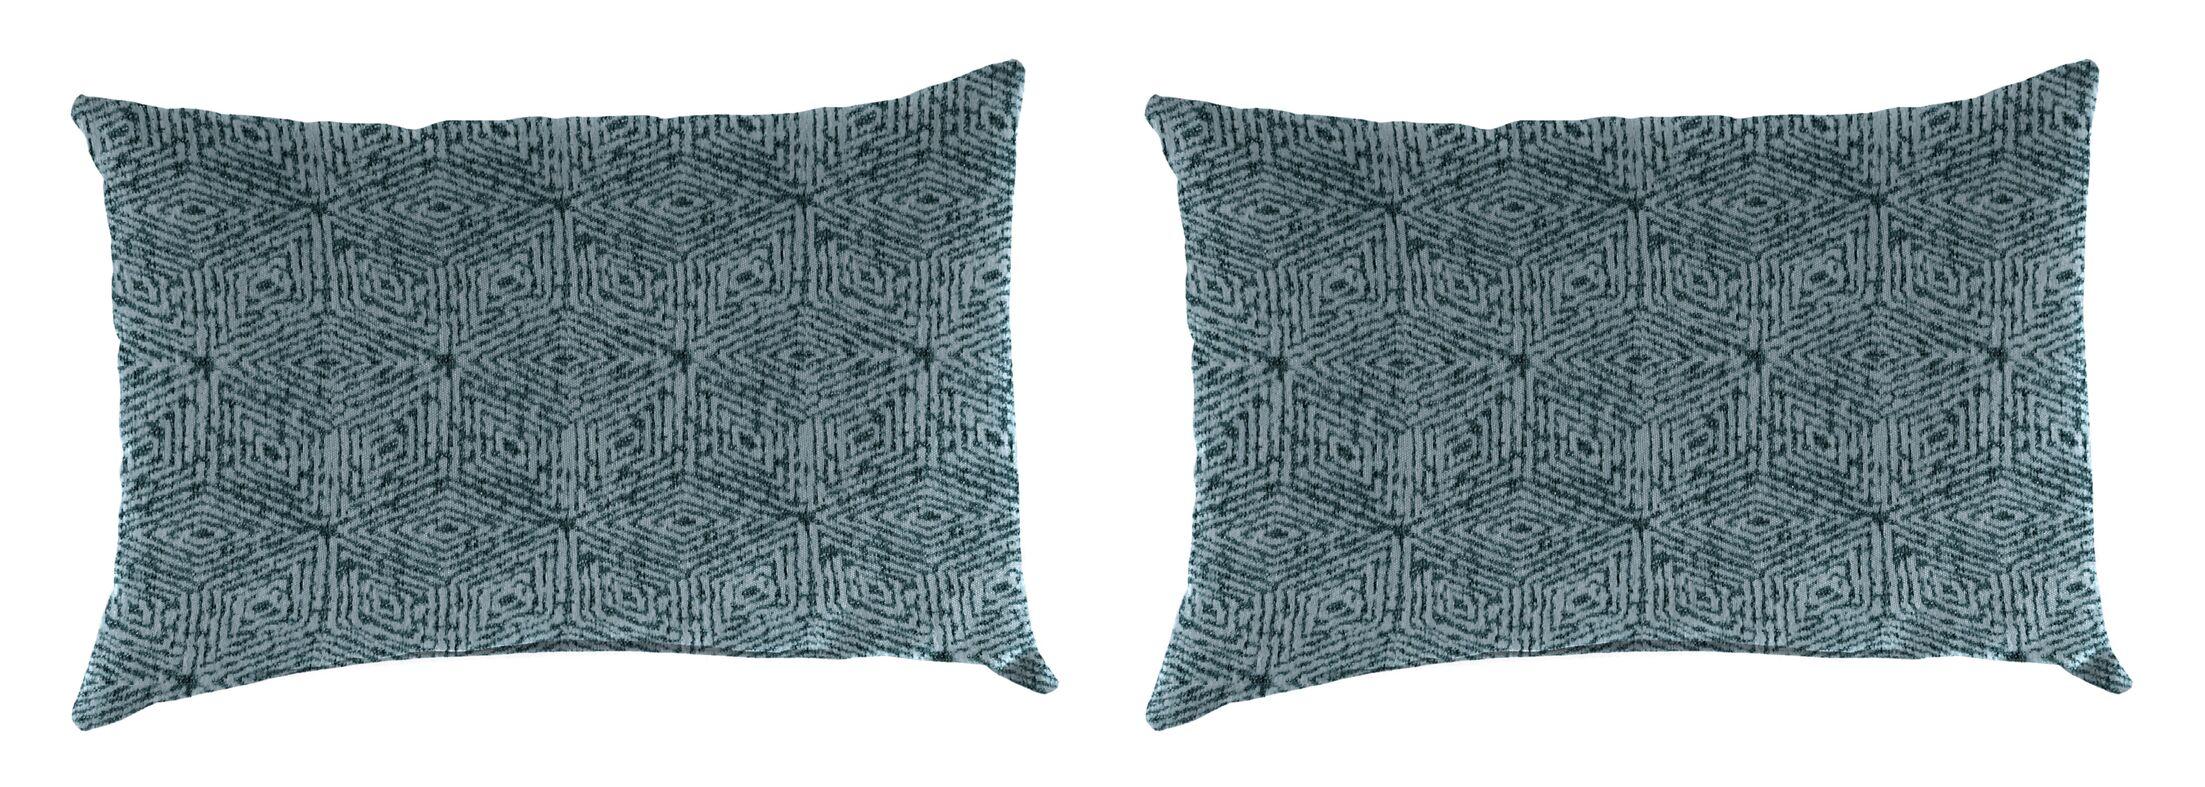 Manfredi Indoor/Outdoor Lumbar Pillow